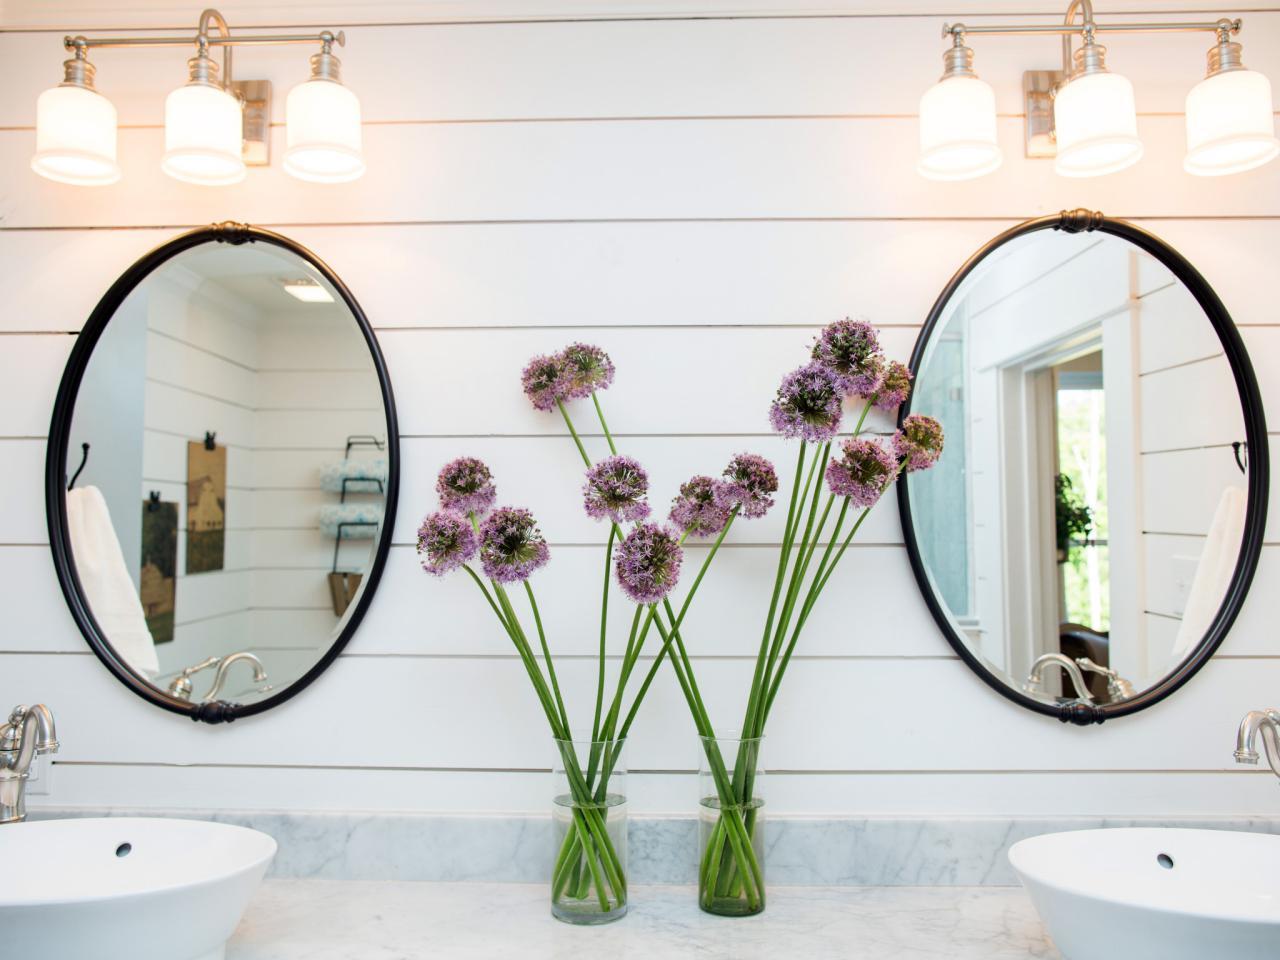 Fixer upper living rooms further joanna gaines fixer upper bathroom - Plant Life Wildflowers